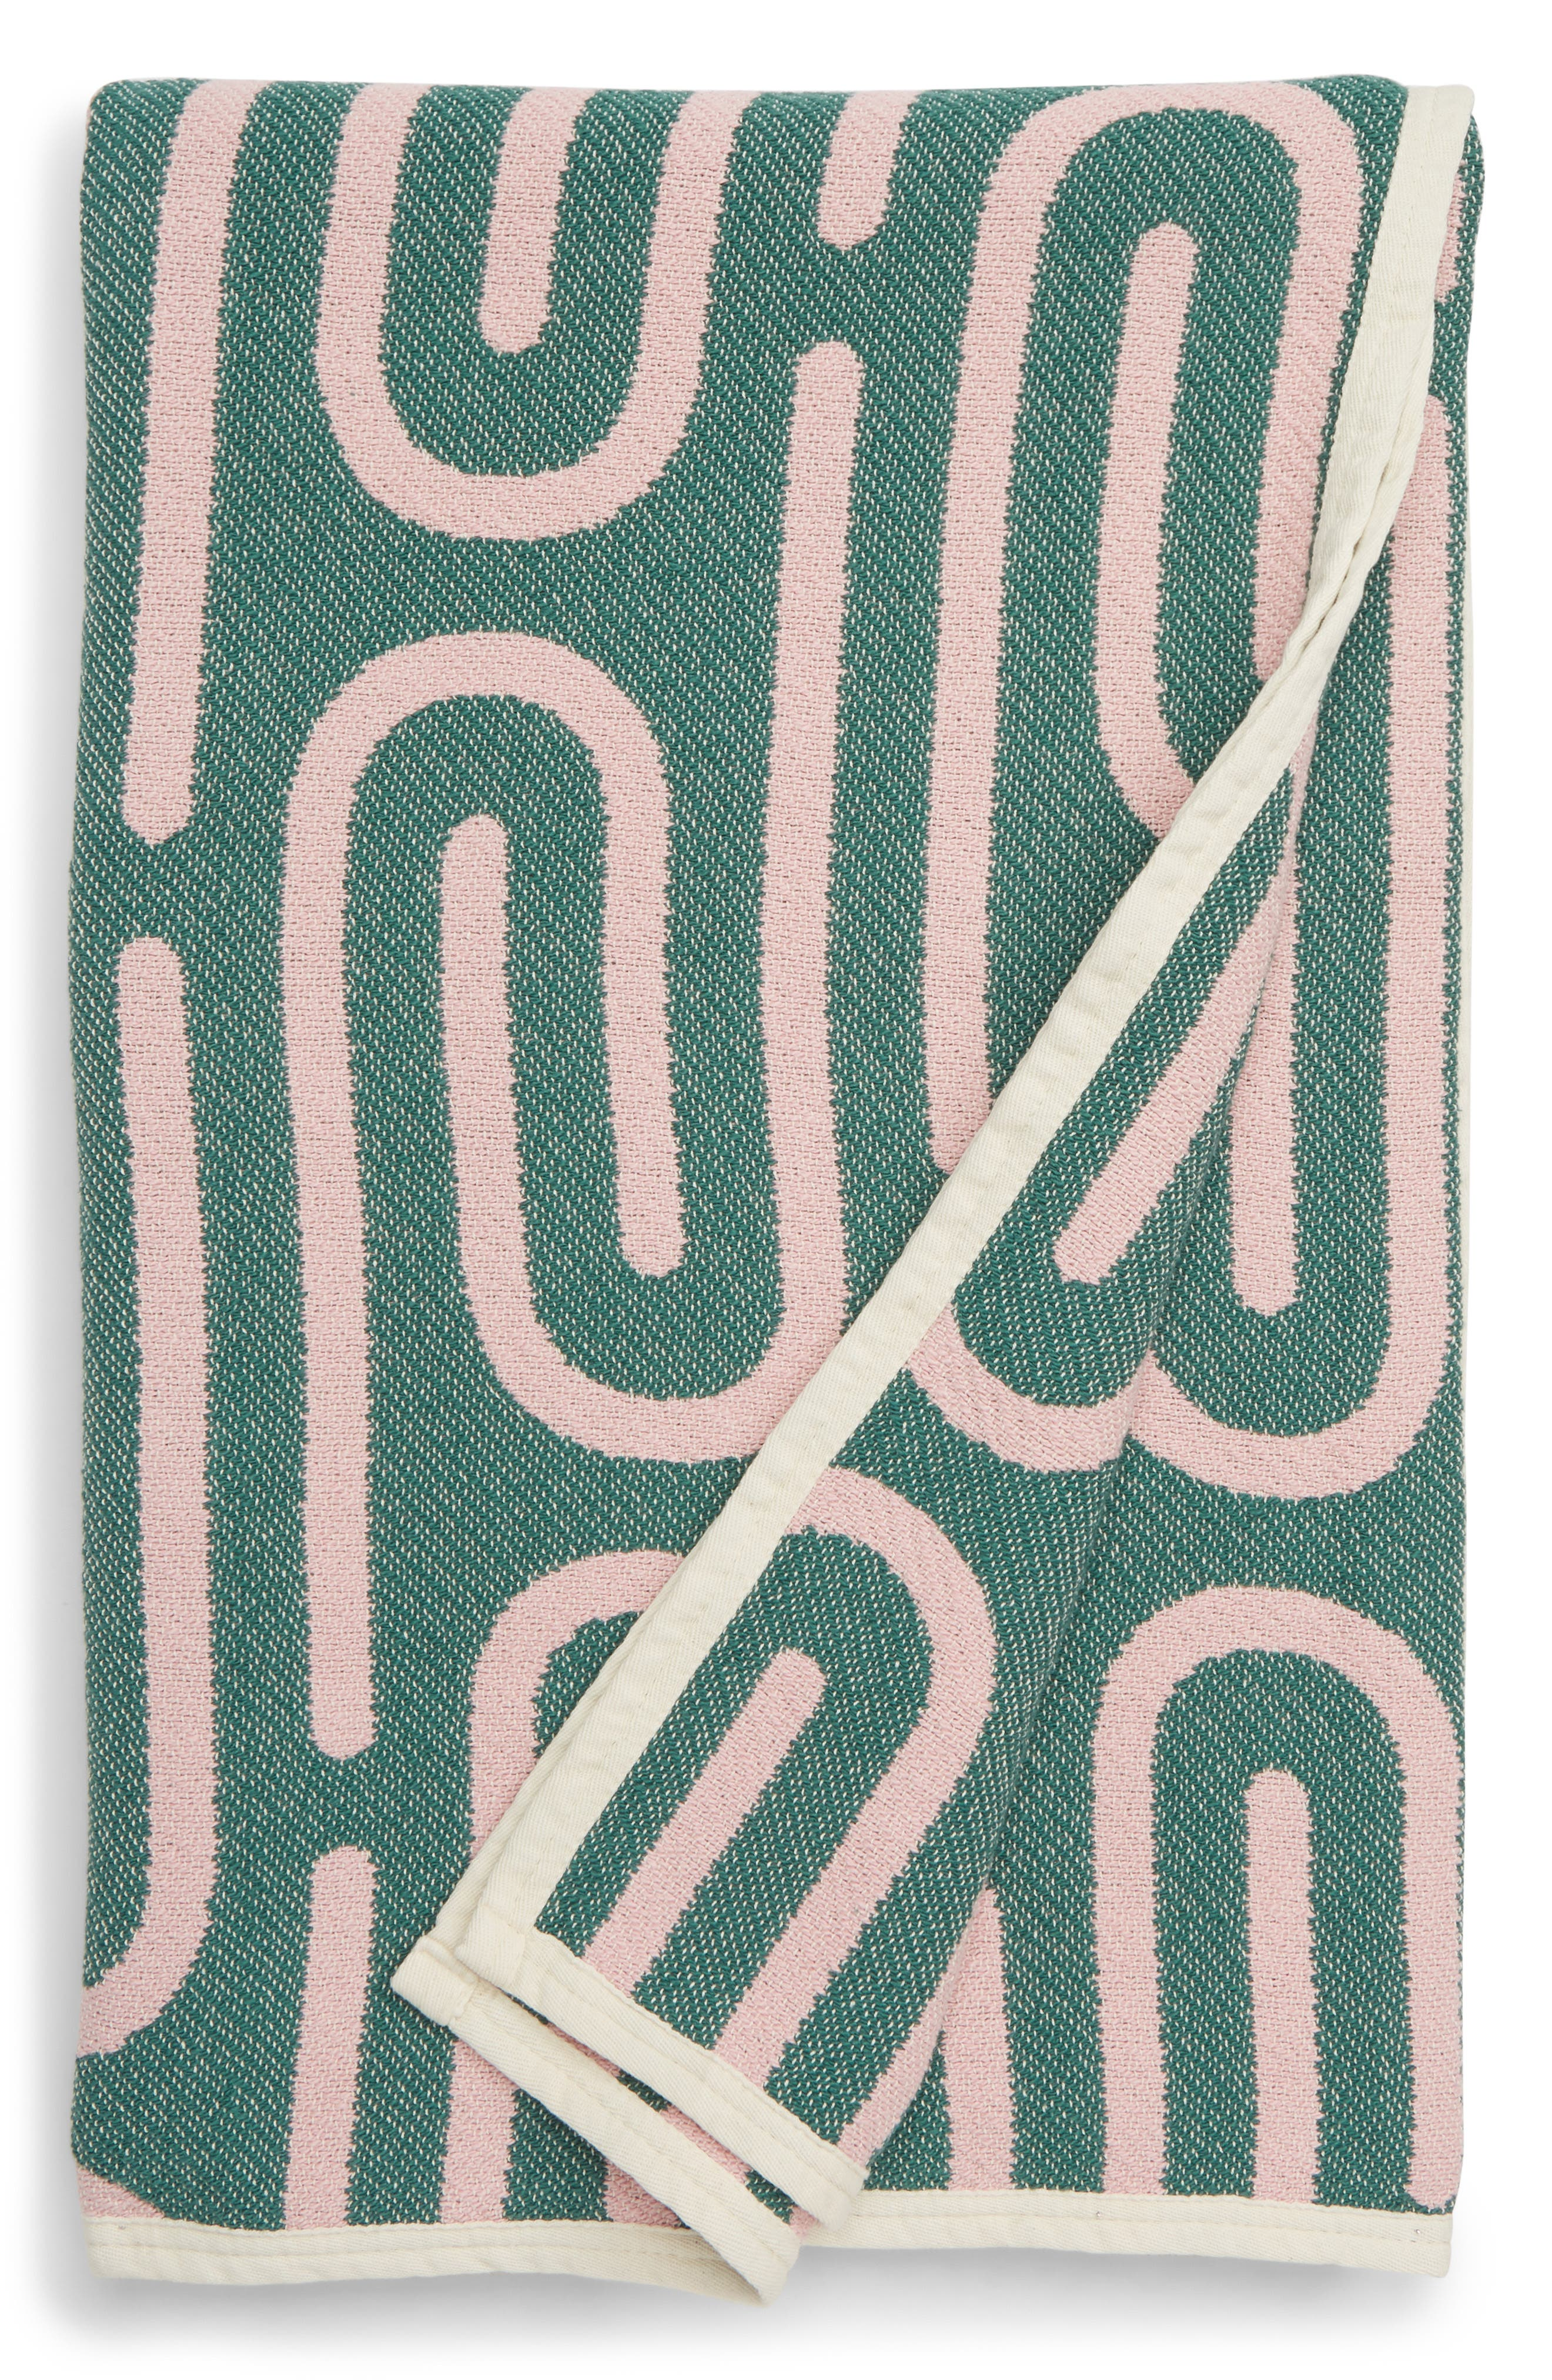 DUSEN DUSEN, Clip Throw Blanket, Main thumbnail 1, color, 100